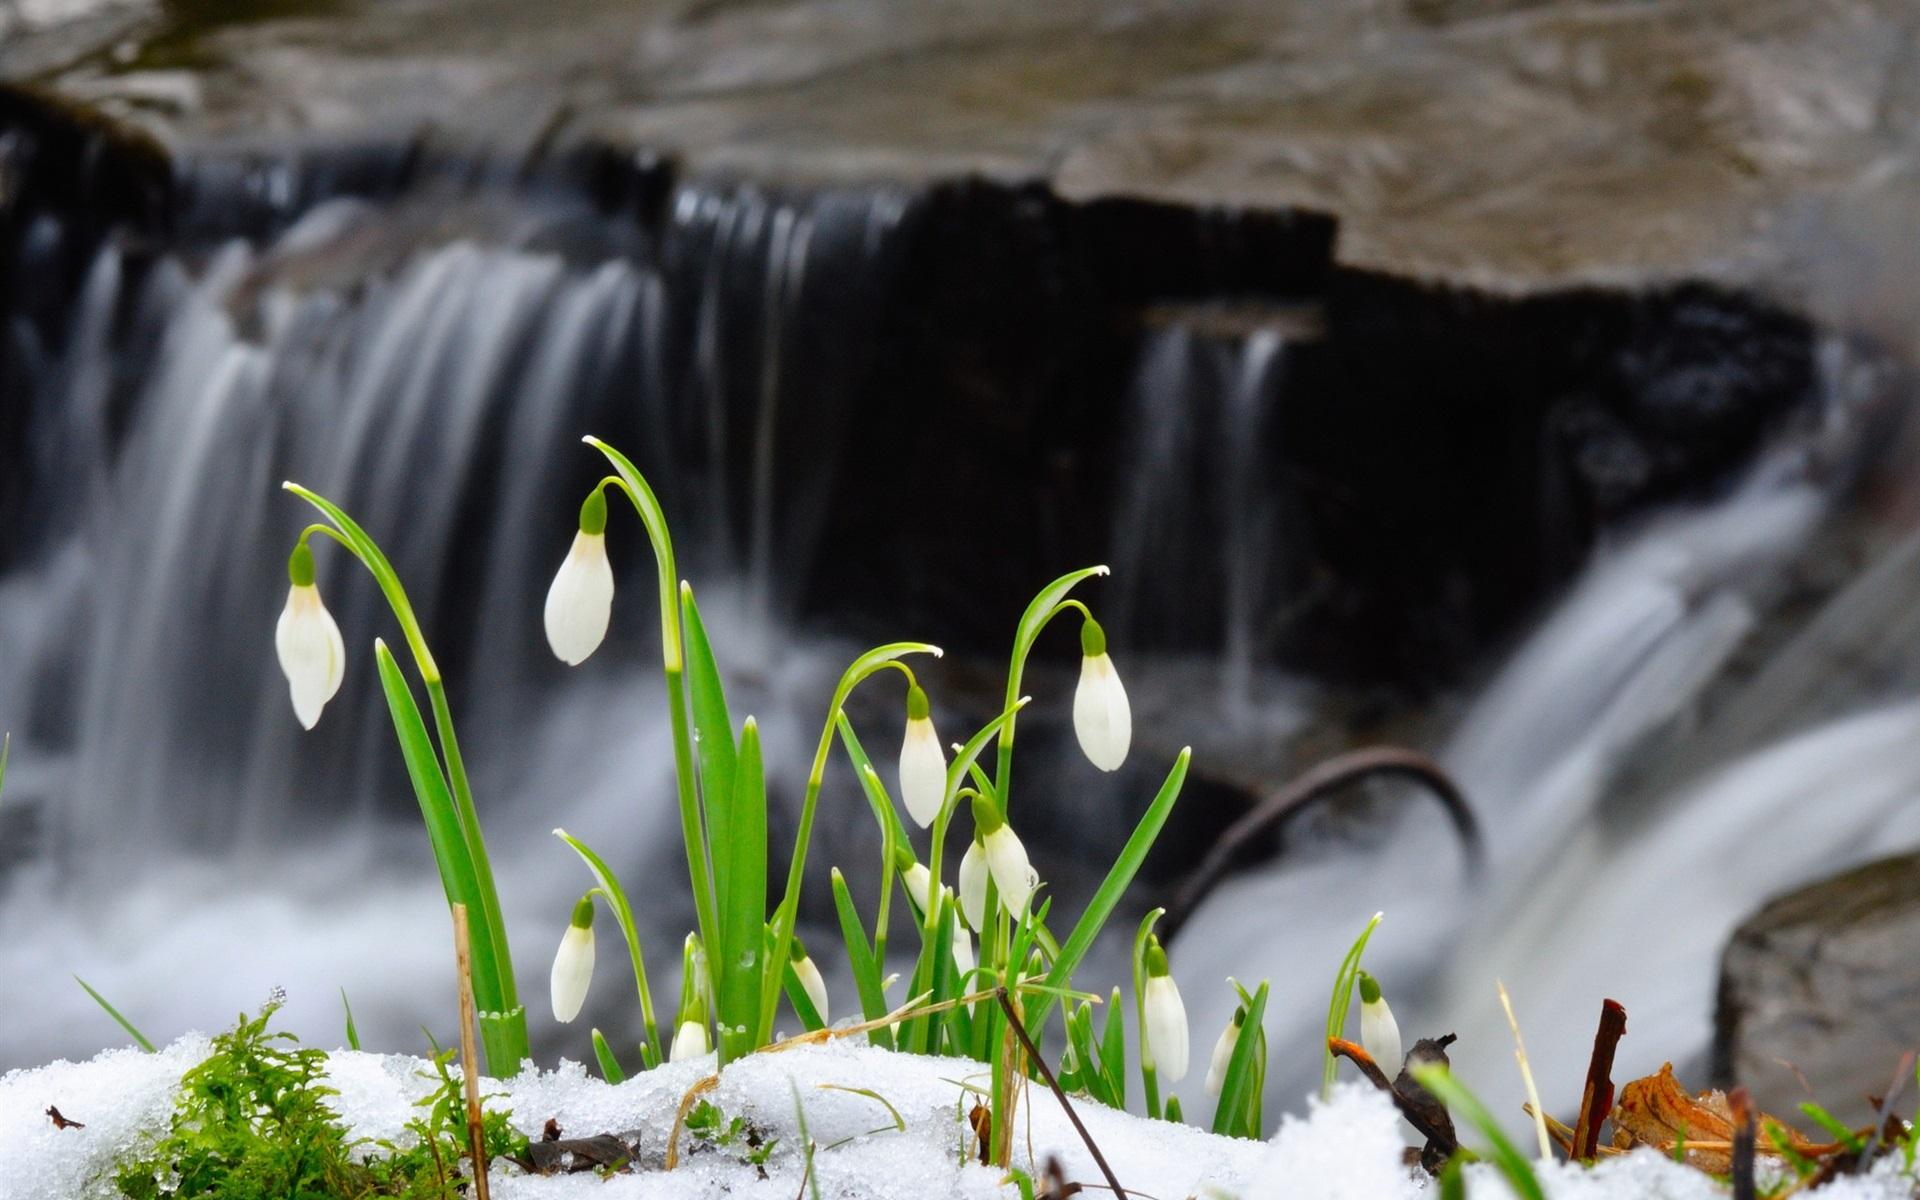 Wallpaper Snowdrop Flowers Snow Waterfall 1920x1200 Hd